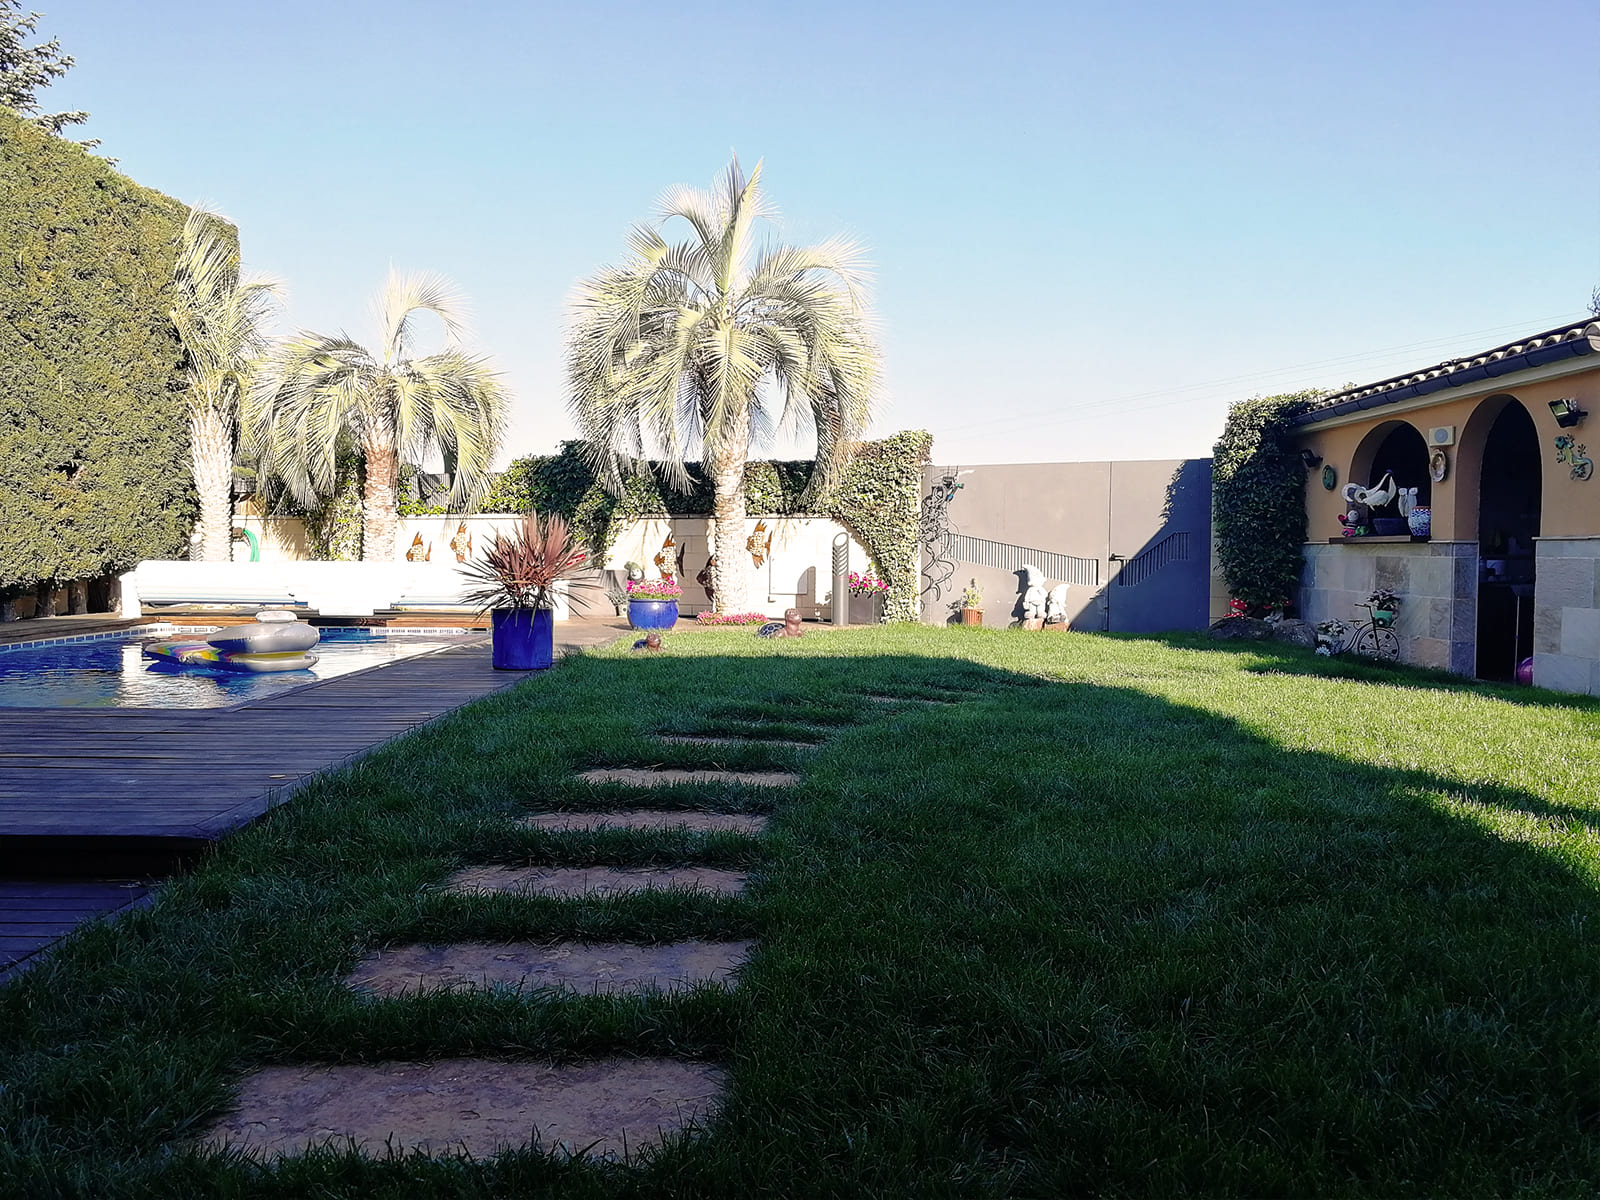 diseño-jardines-palmeras-abeto-LF-10_HIDROJARDIN-Bañeres